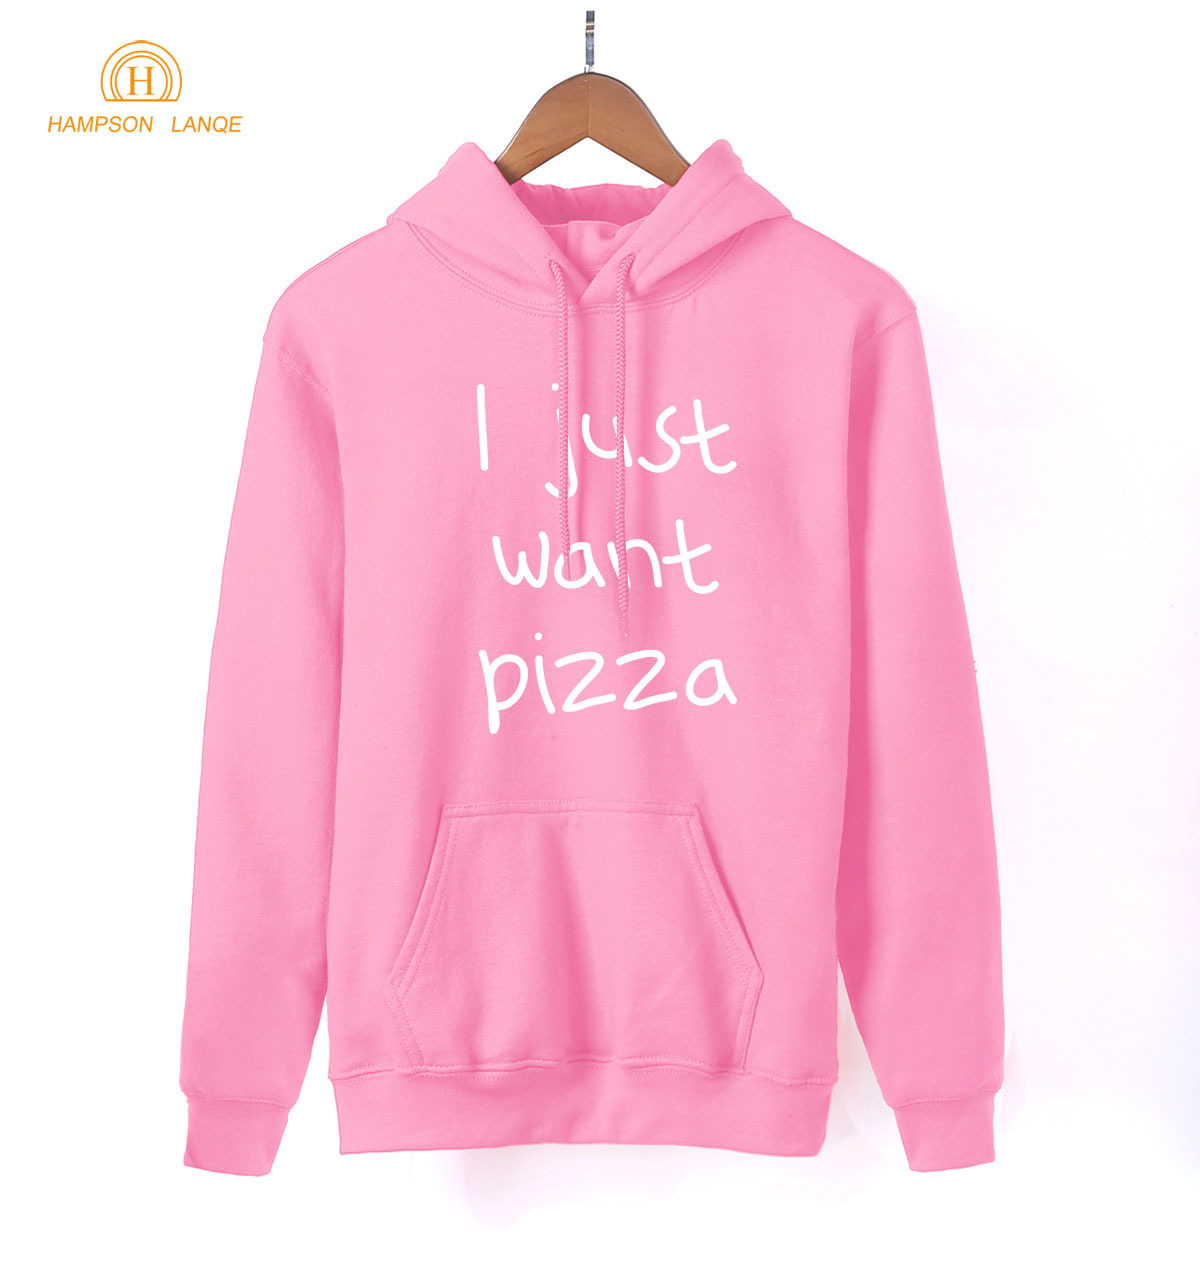 HAMPSON LANQE I Just Want Pizza Adult Pink Kawaii Hoodies 2019 Hot Spring Autumn Sweatshirts Women K-pop Warm Fleece Tracksuit